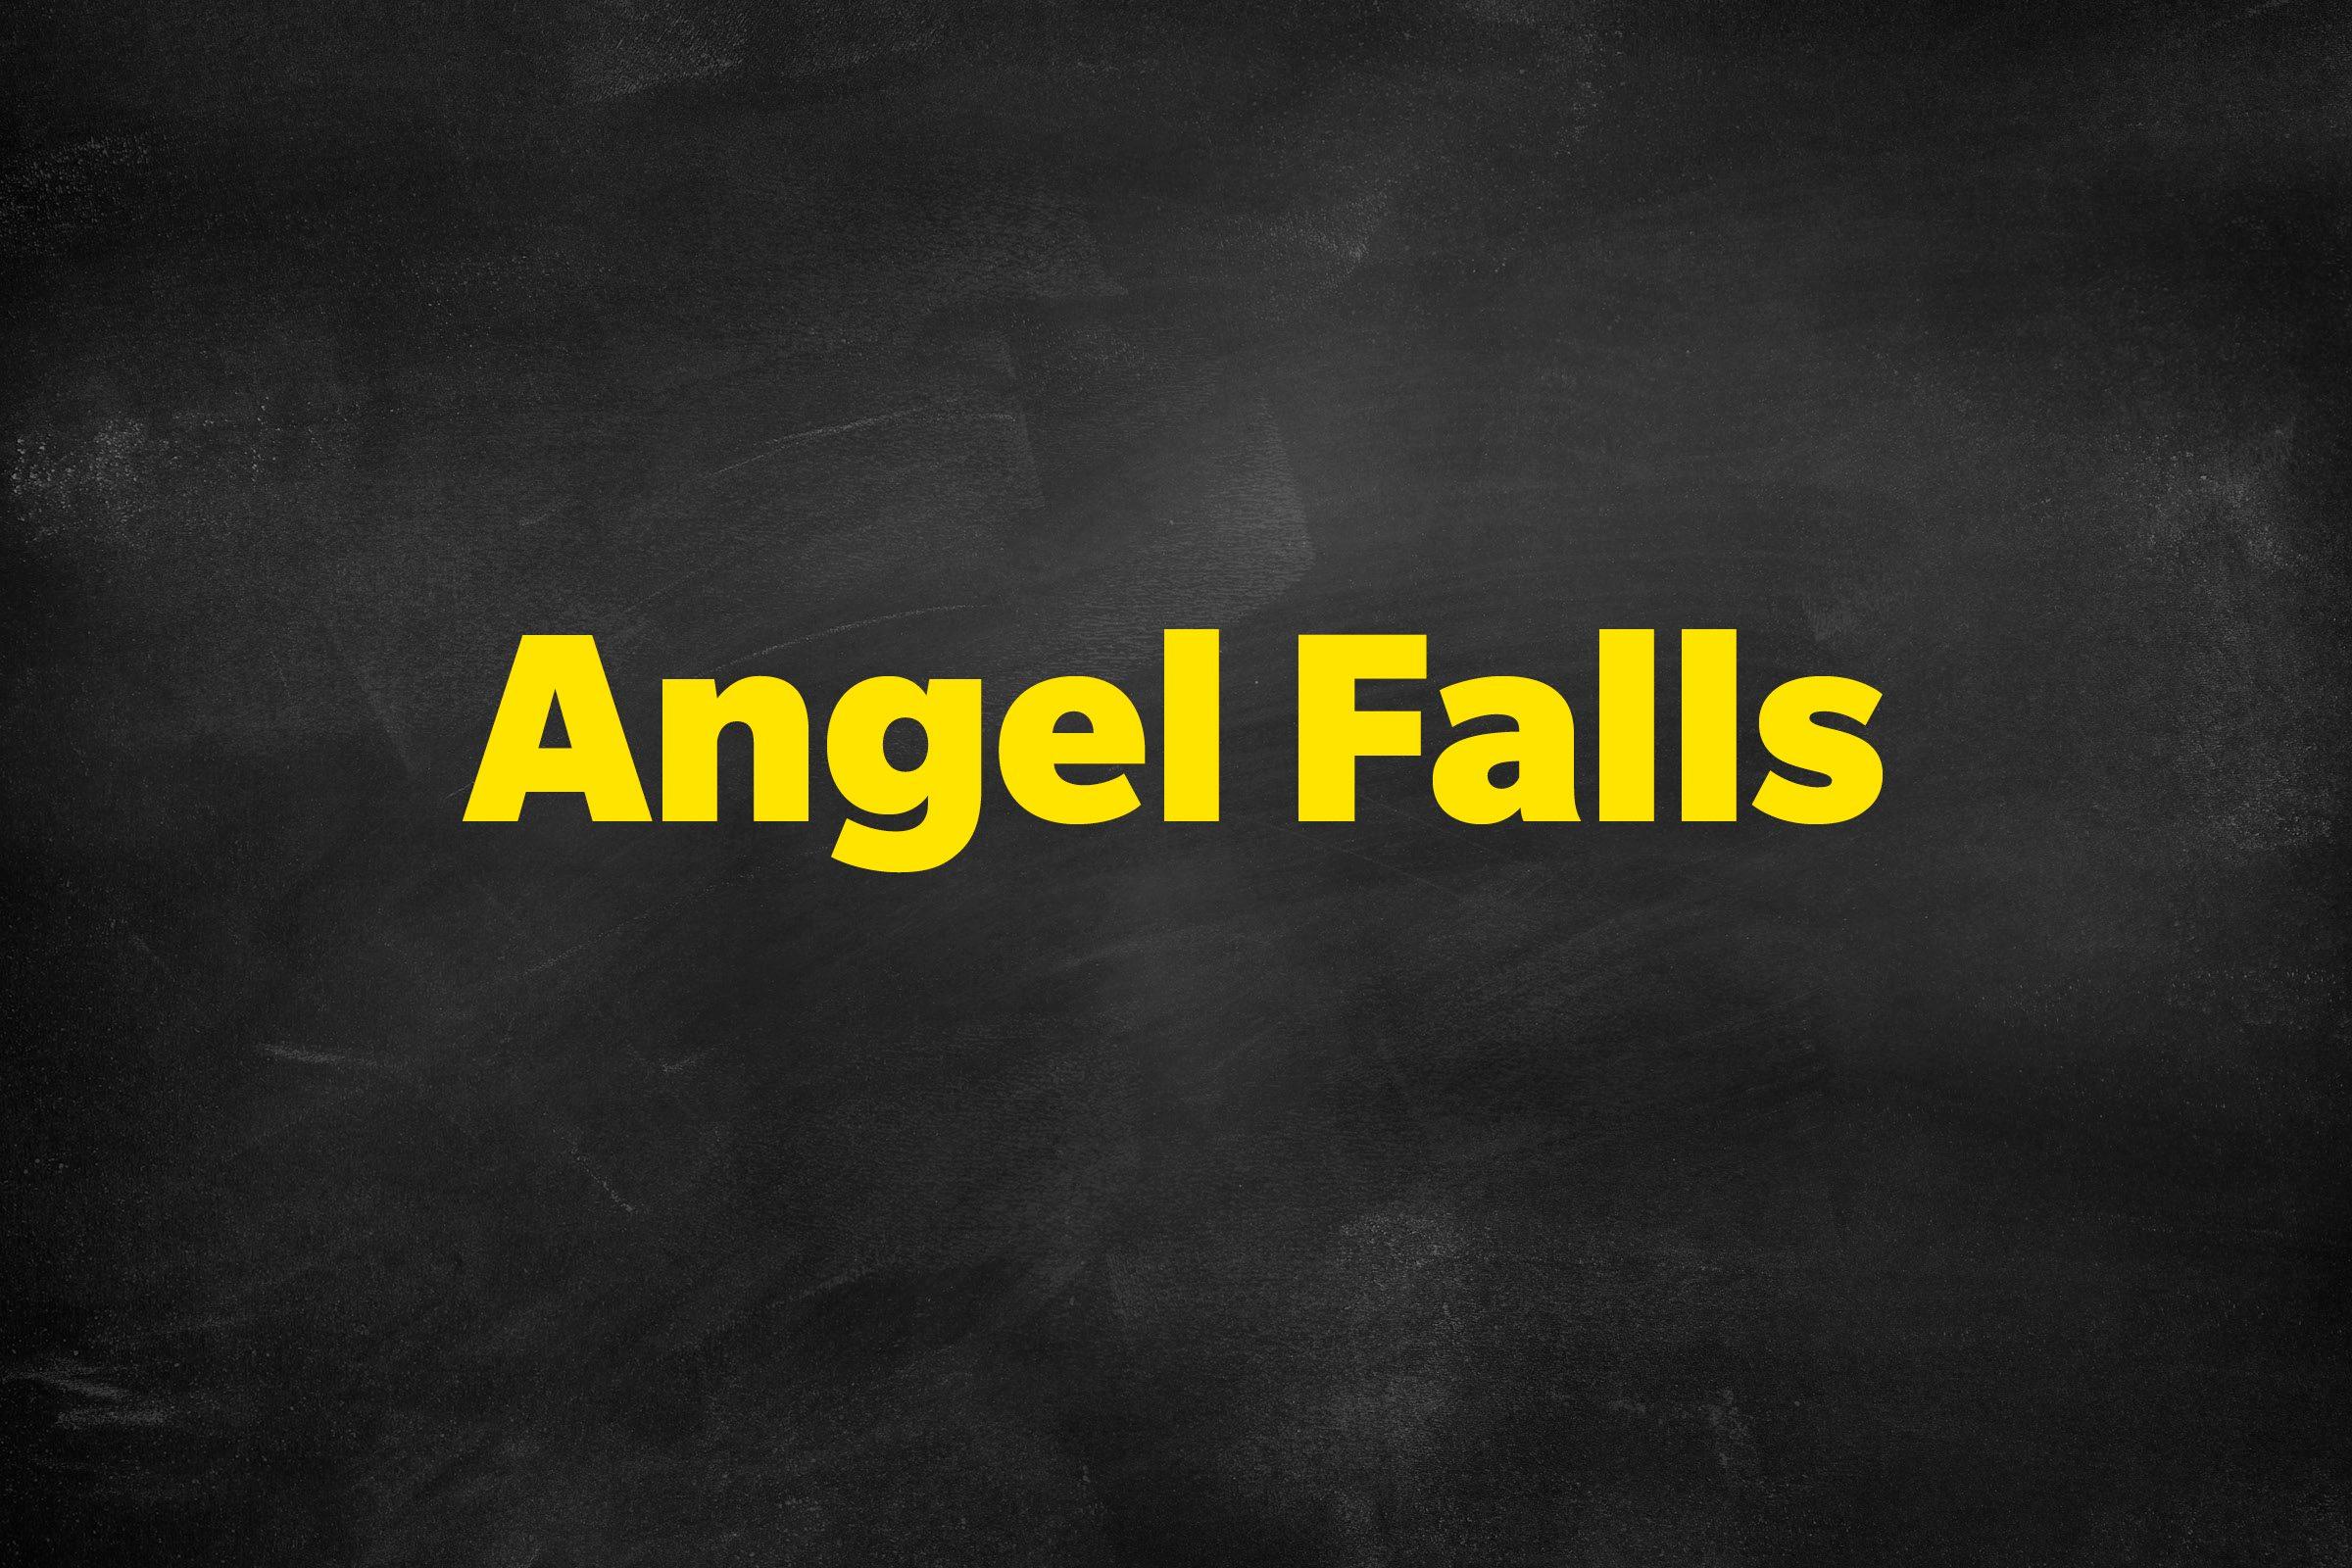 Answer: Angel Falls